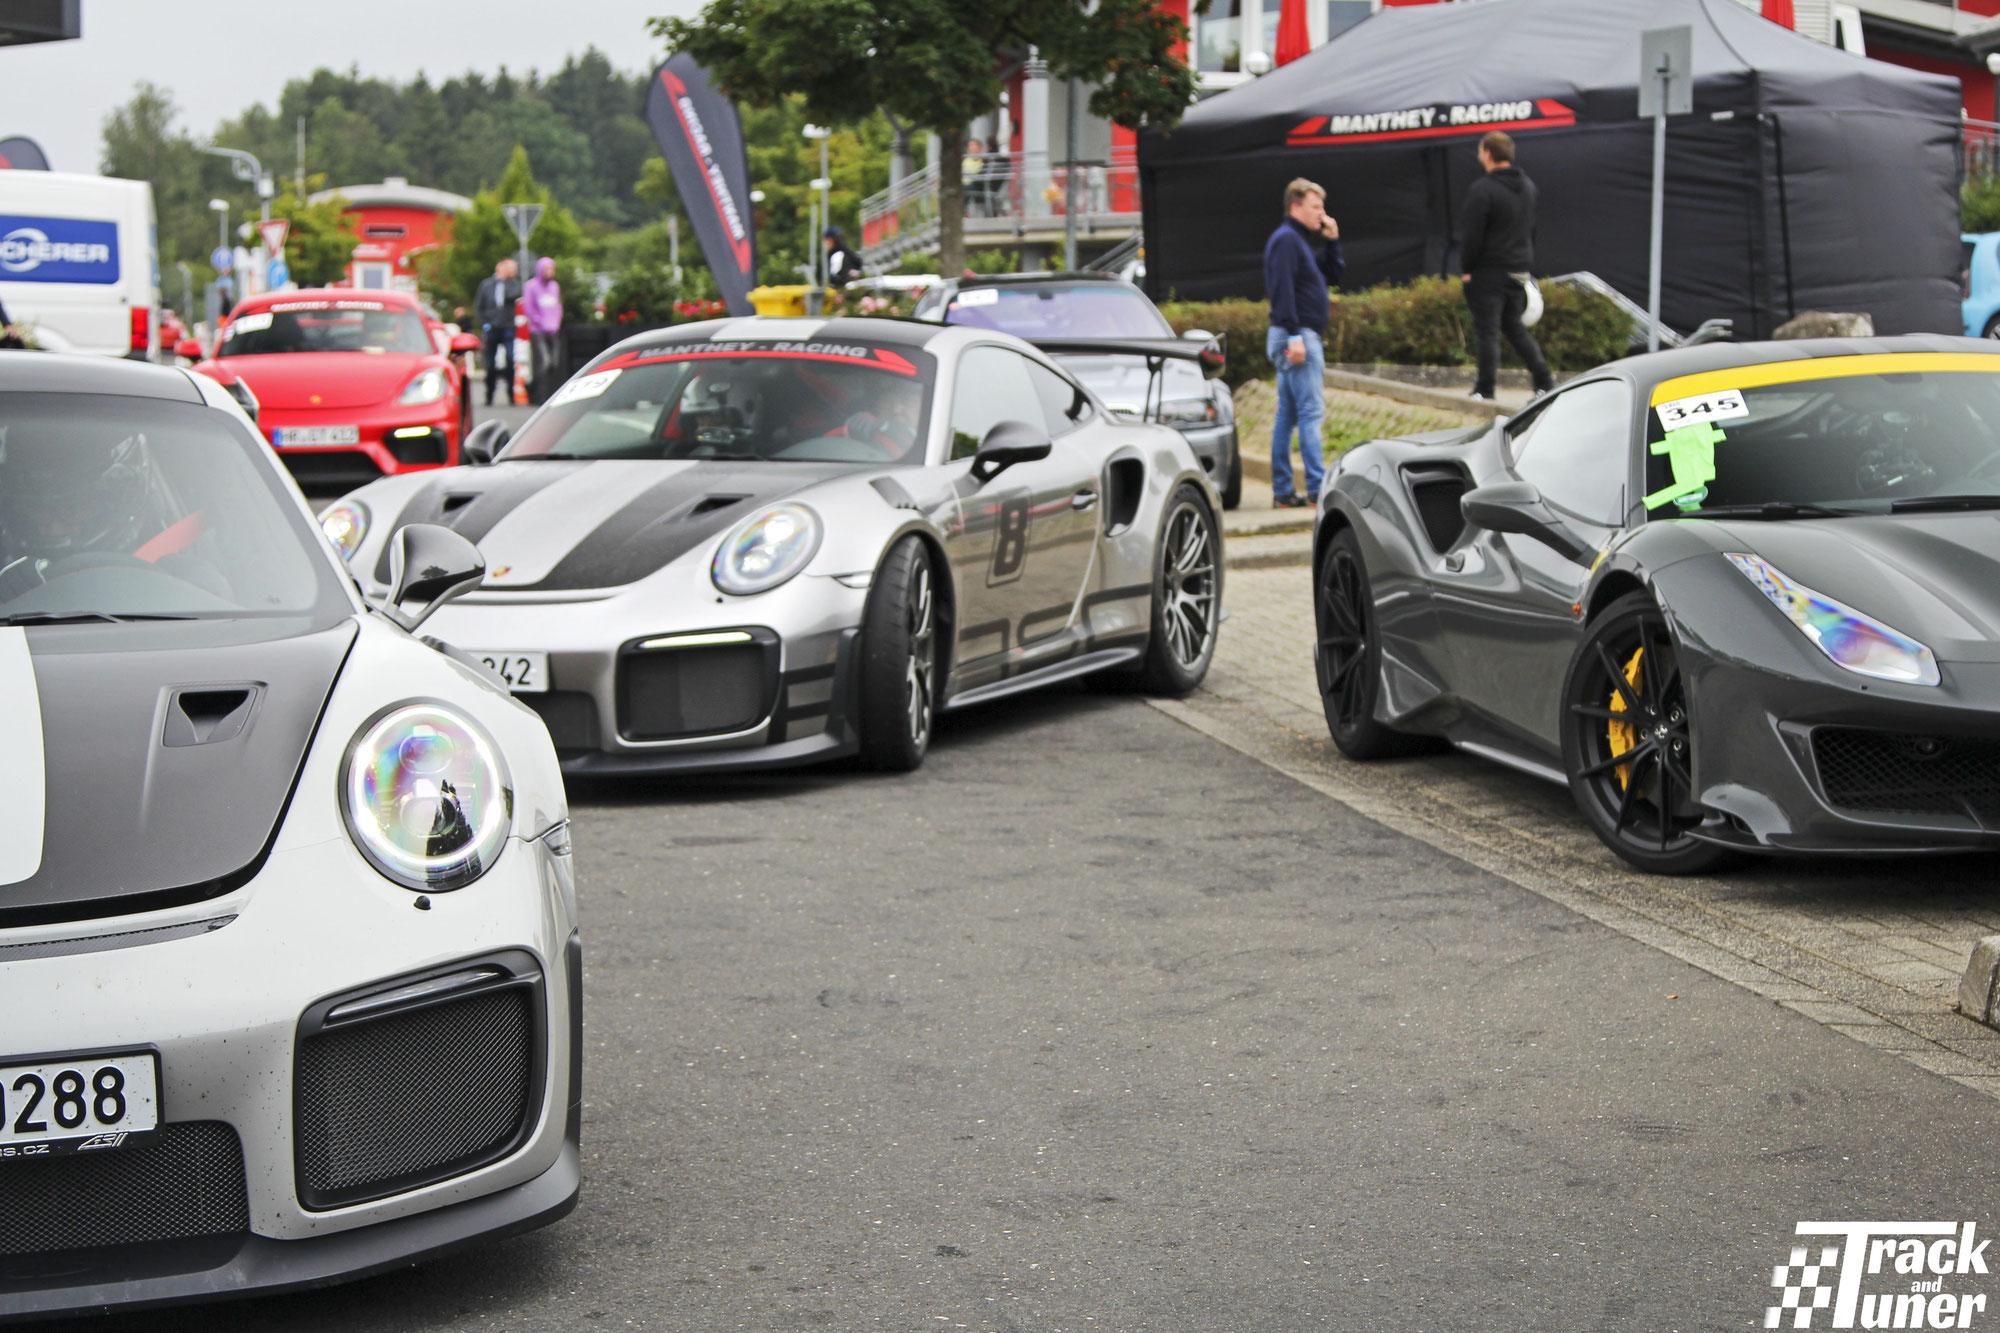 Trackdays.de: Porsche GT2RS vs 488 Pista?